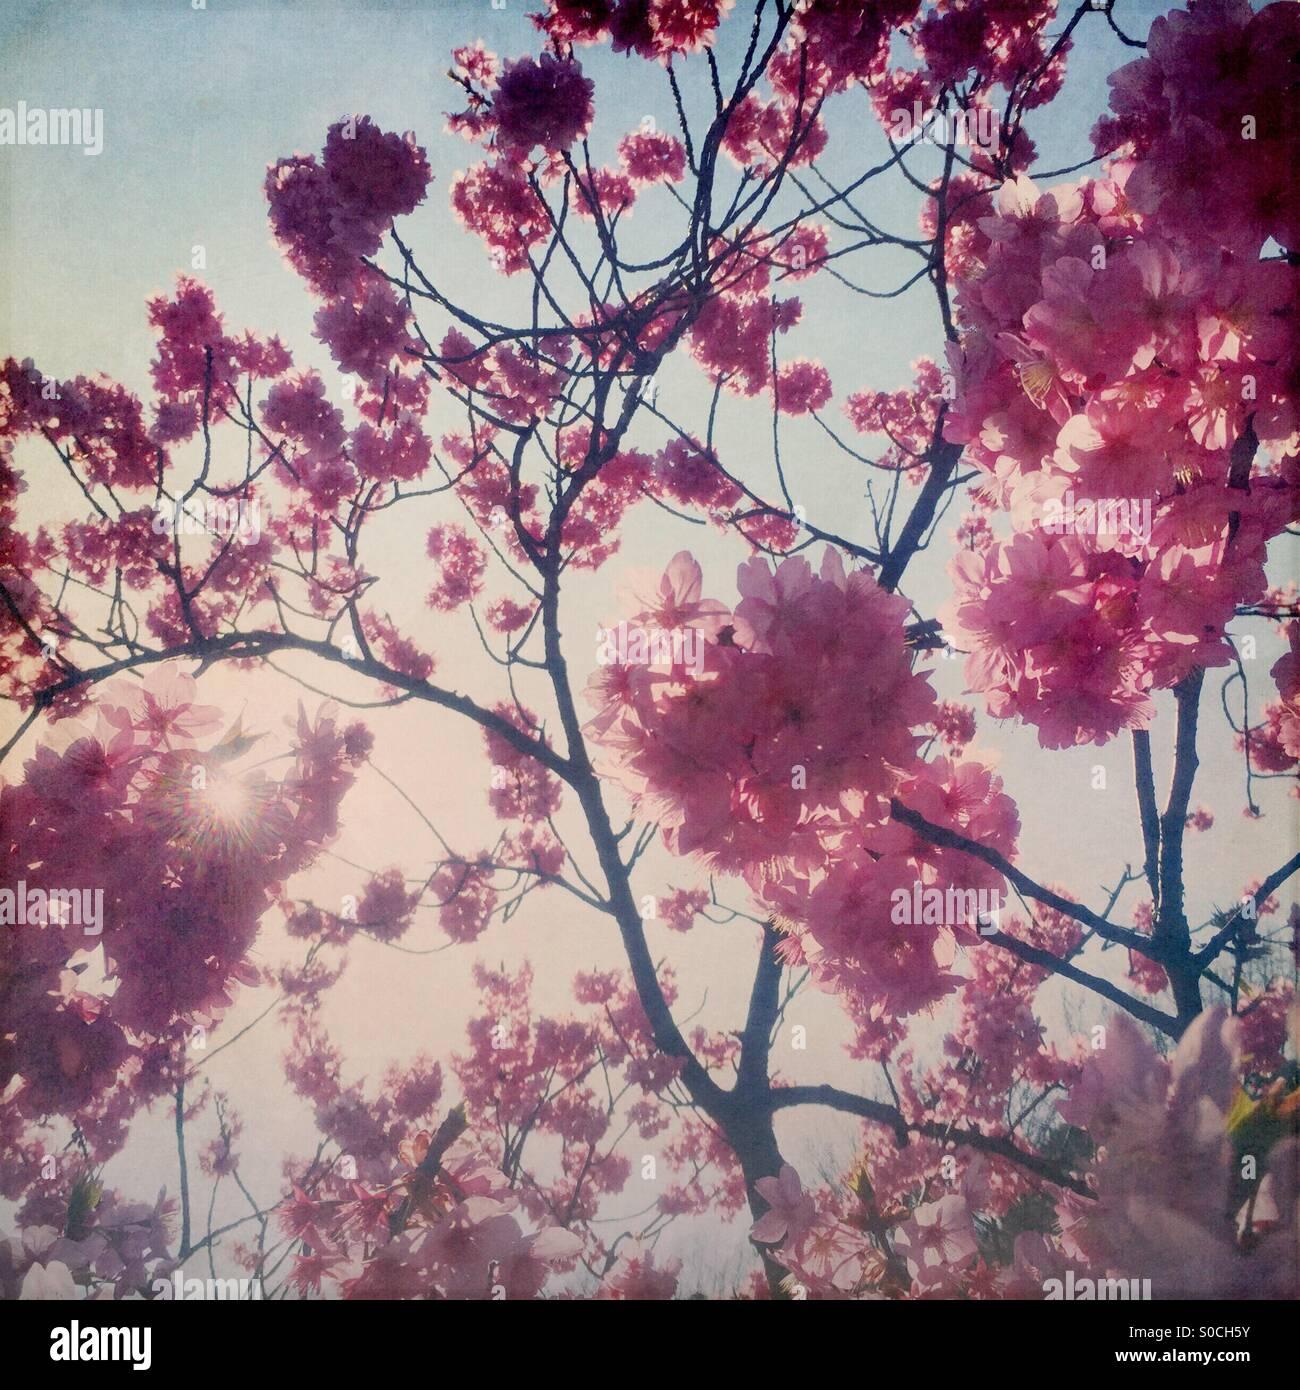 Backlit Yokohamahizakura, a variety of Sakura or cherry blossom with deep pink color. Vignette and vintage paper - Stock Image